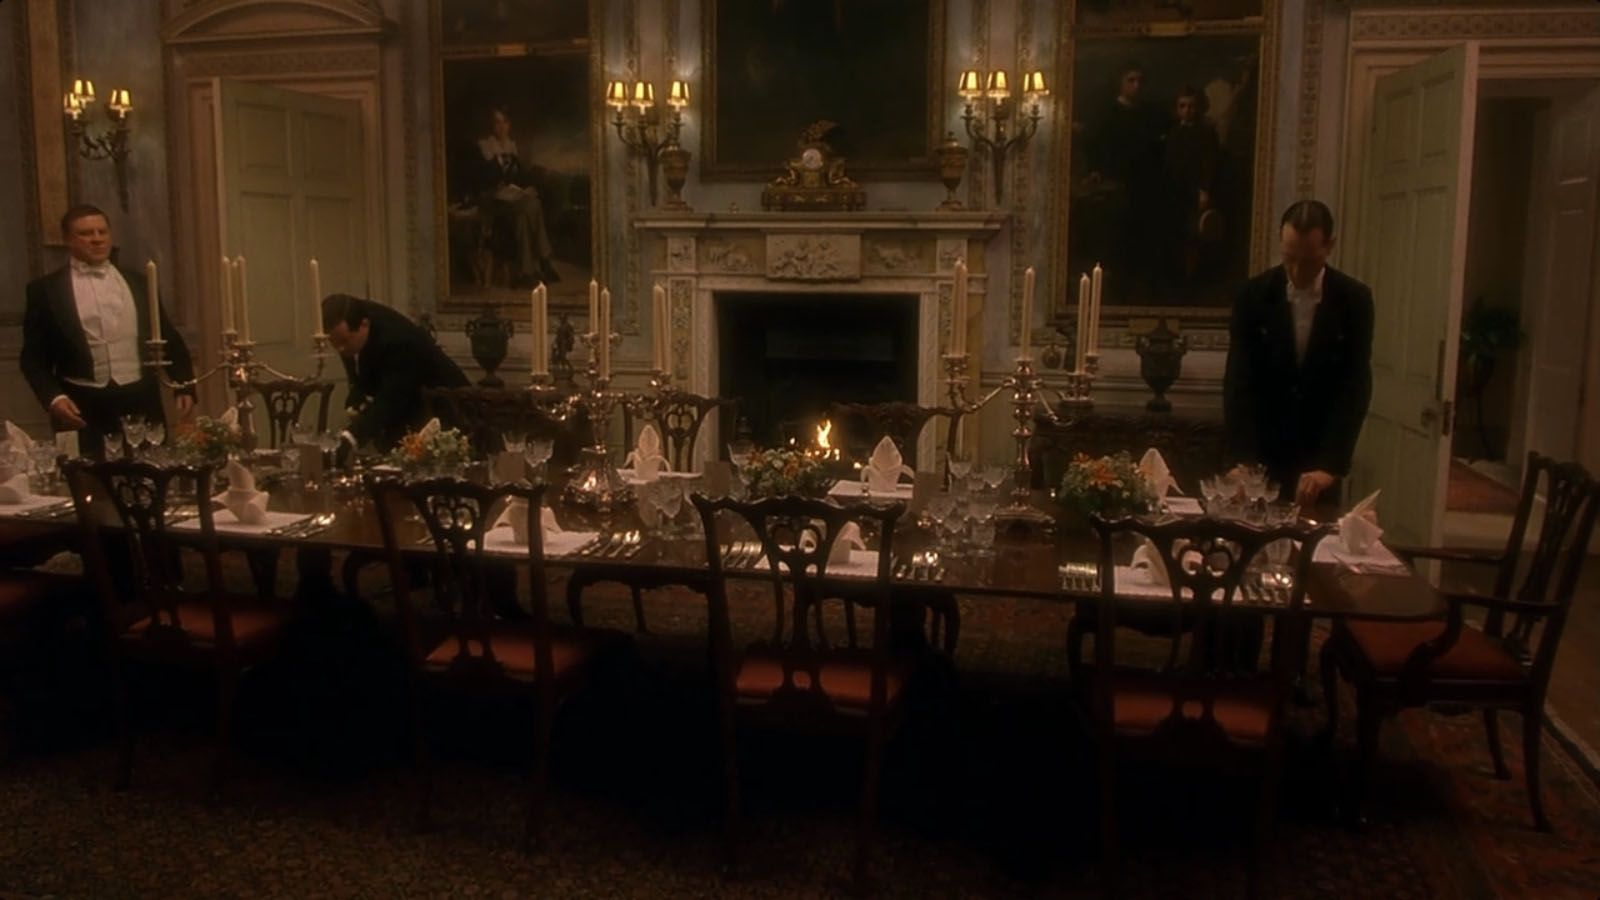 Gosford Park Dir Robert Altman 2001